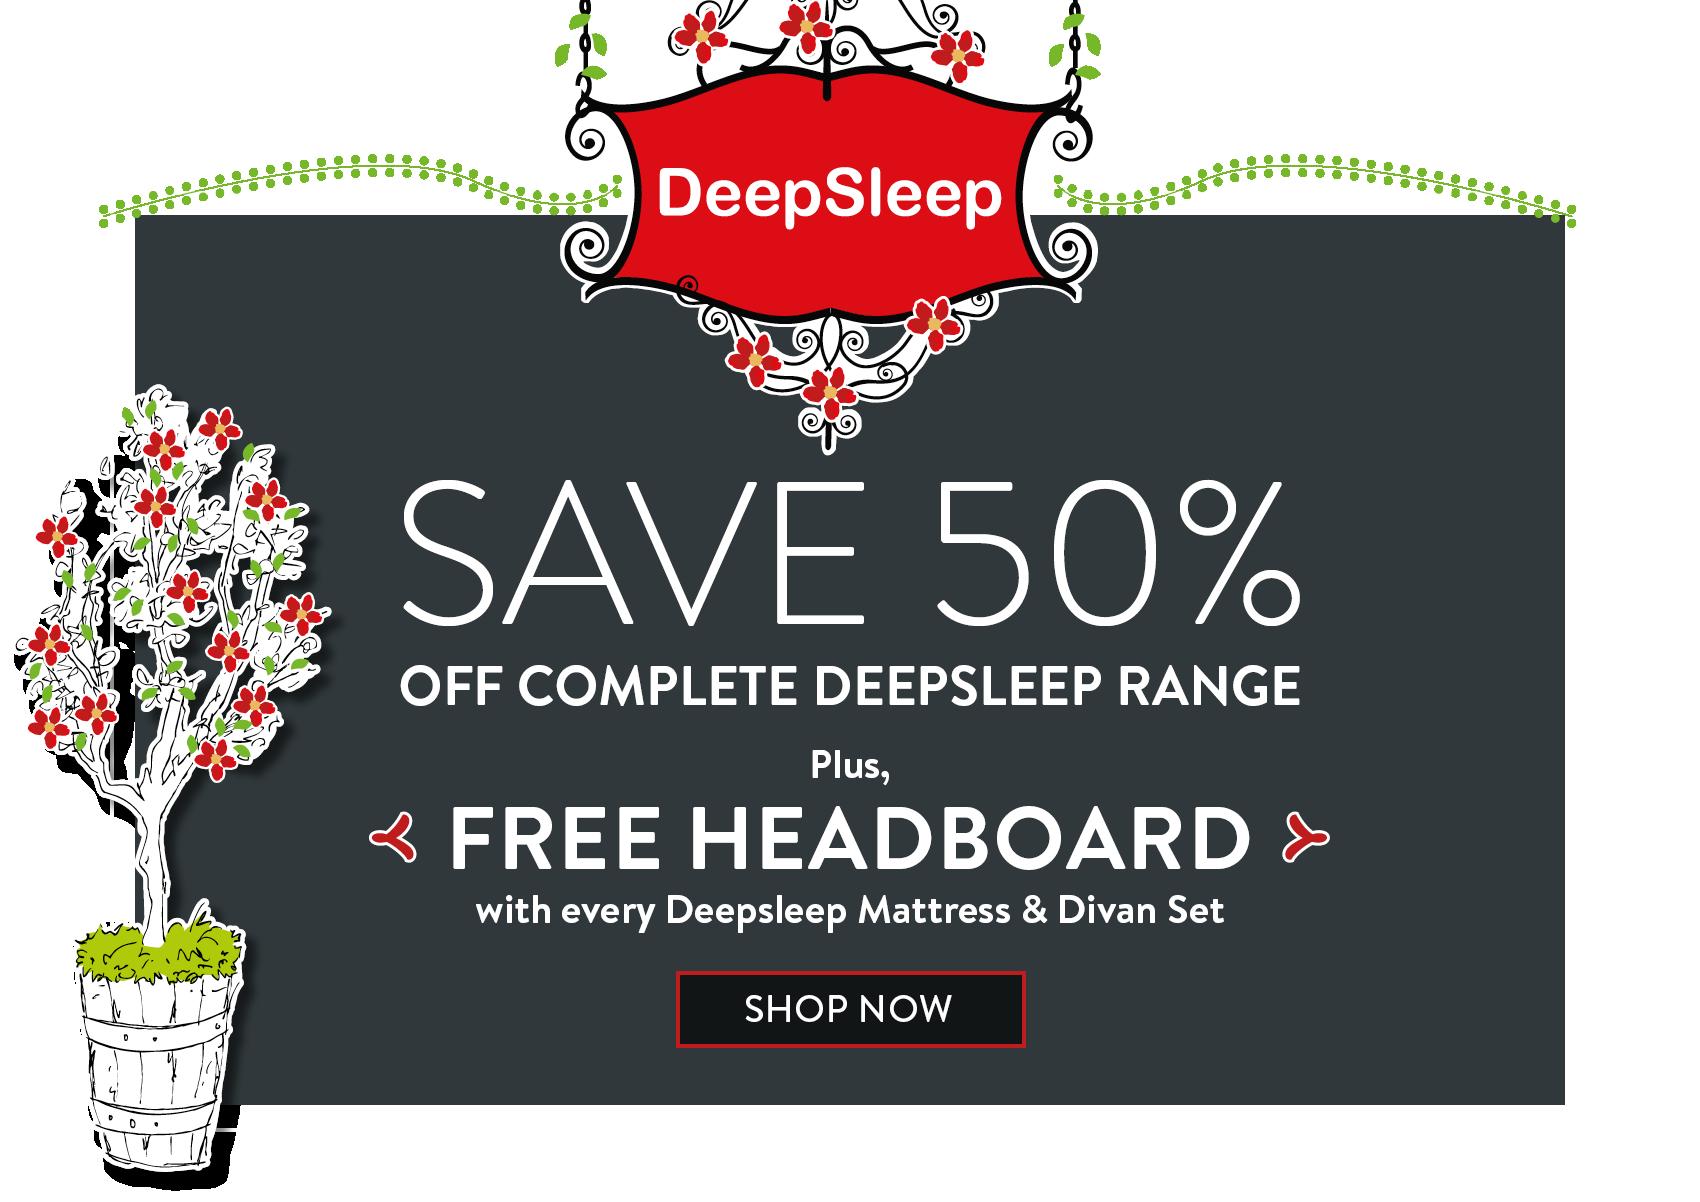 SAVE 50% OFF COMPLETE DEEPSLEEP RANGE Plus, FREE HEADBOARD with every Deepsleep Mattress & Divan Set